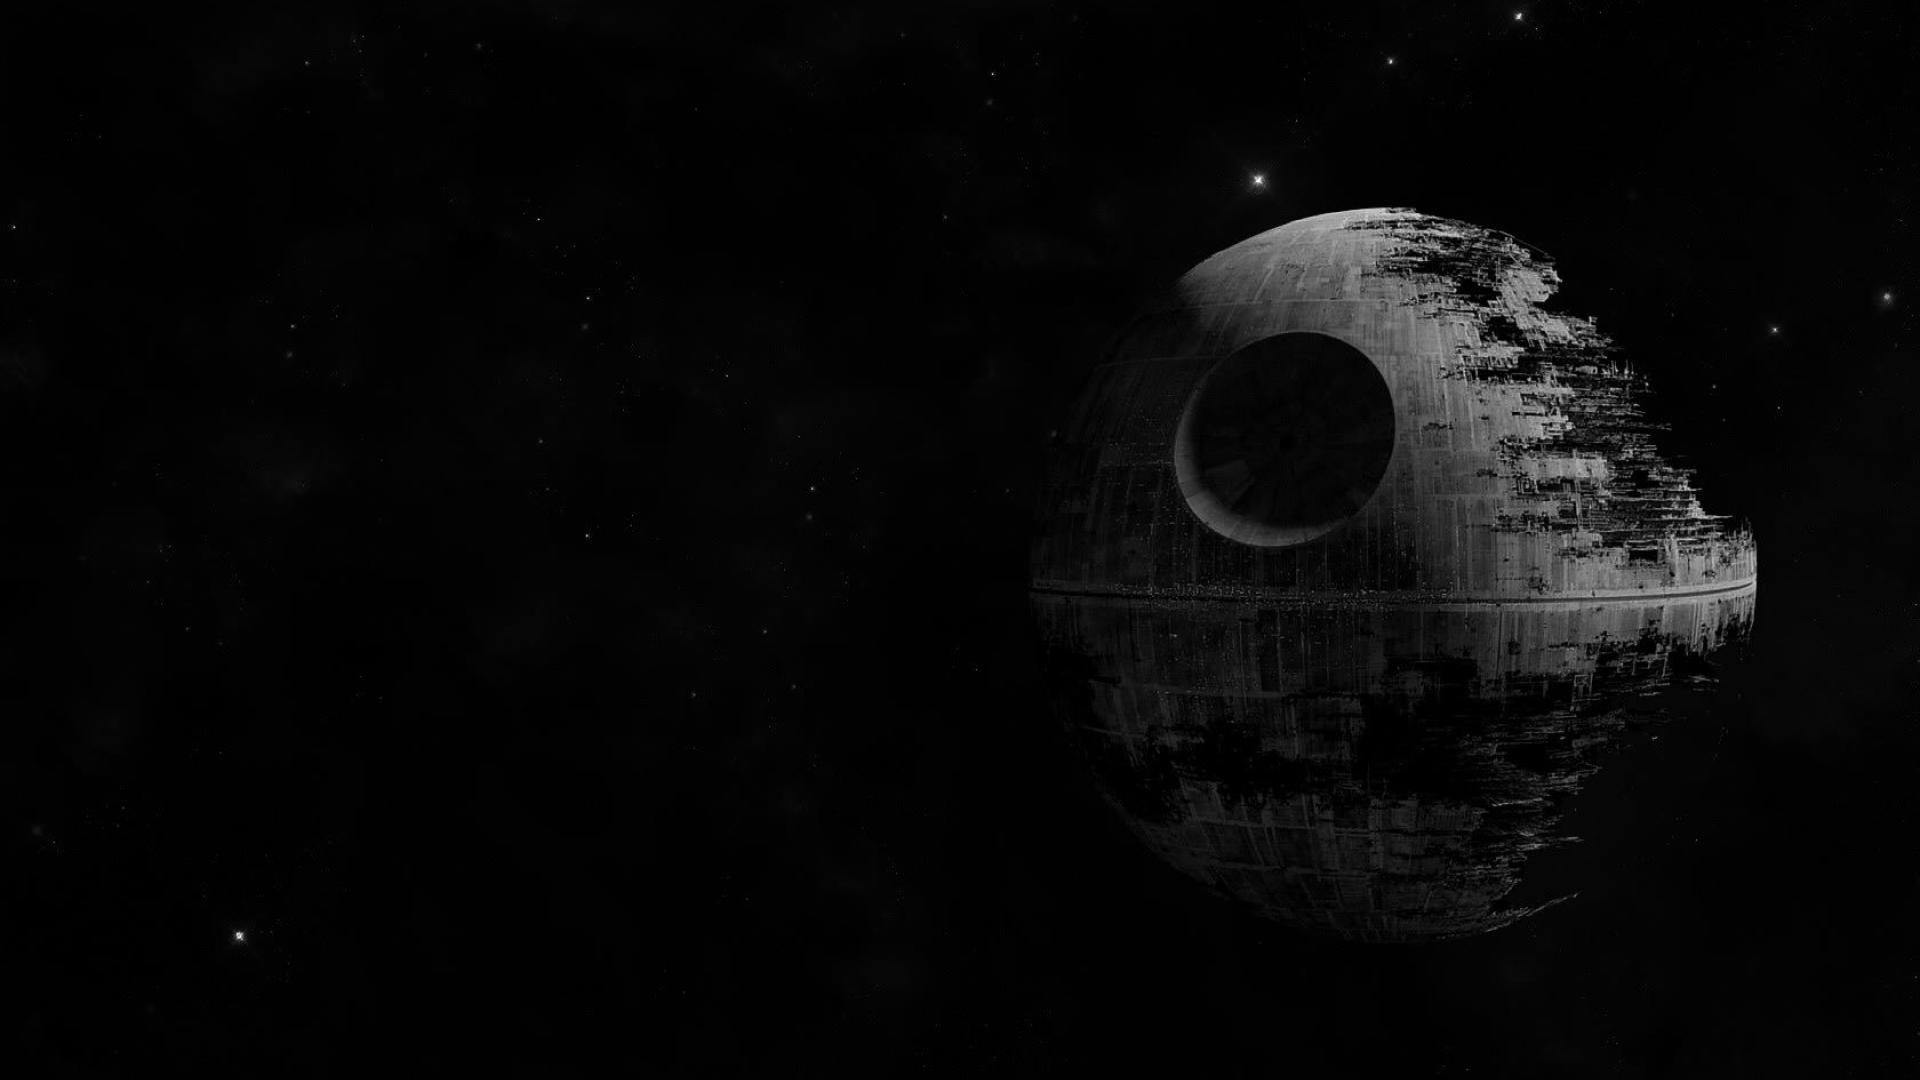 Macbook Air Wallpaper Star Wars Wallpaper Hd For Android